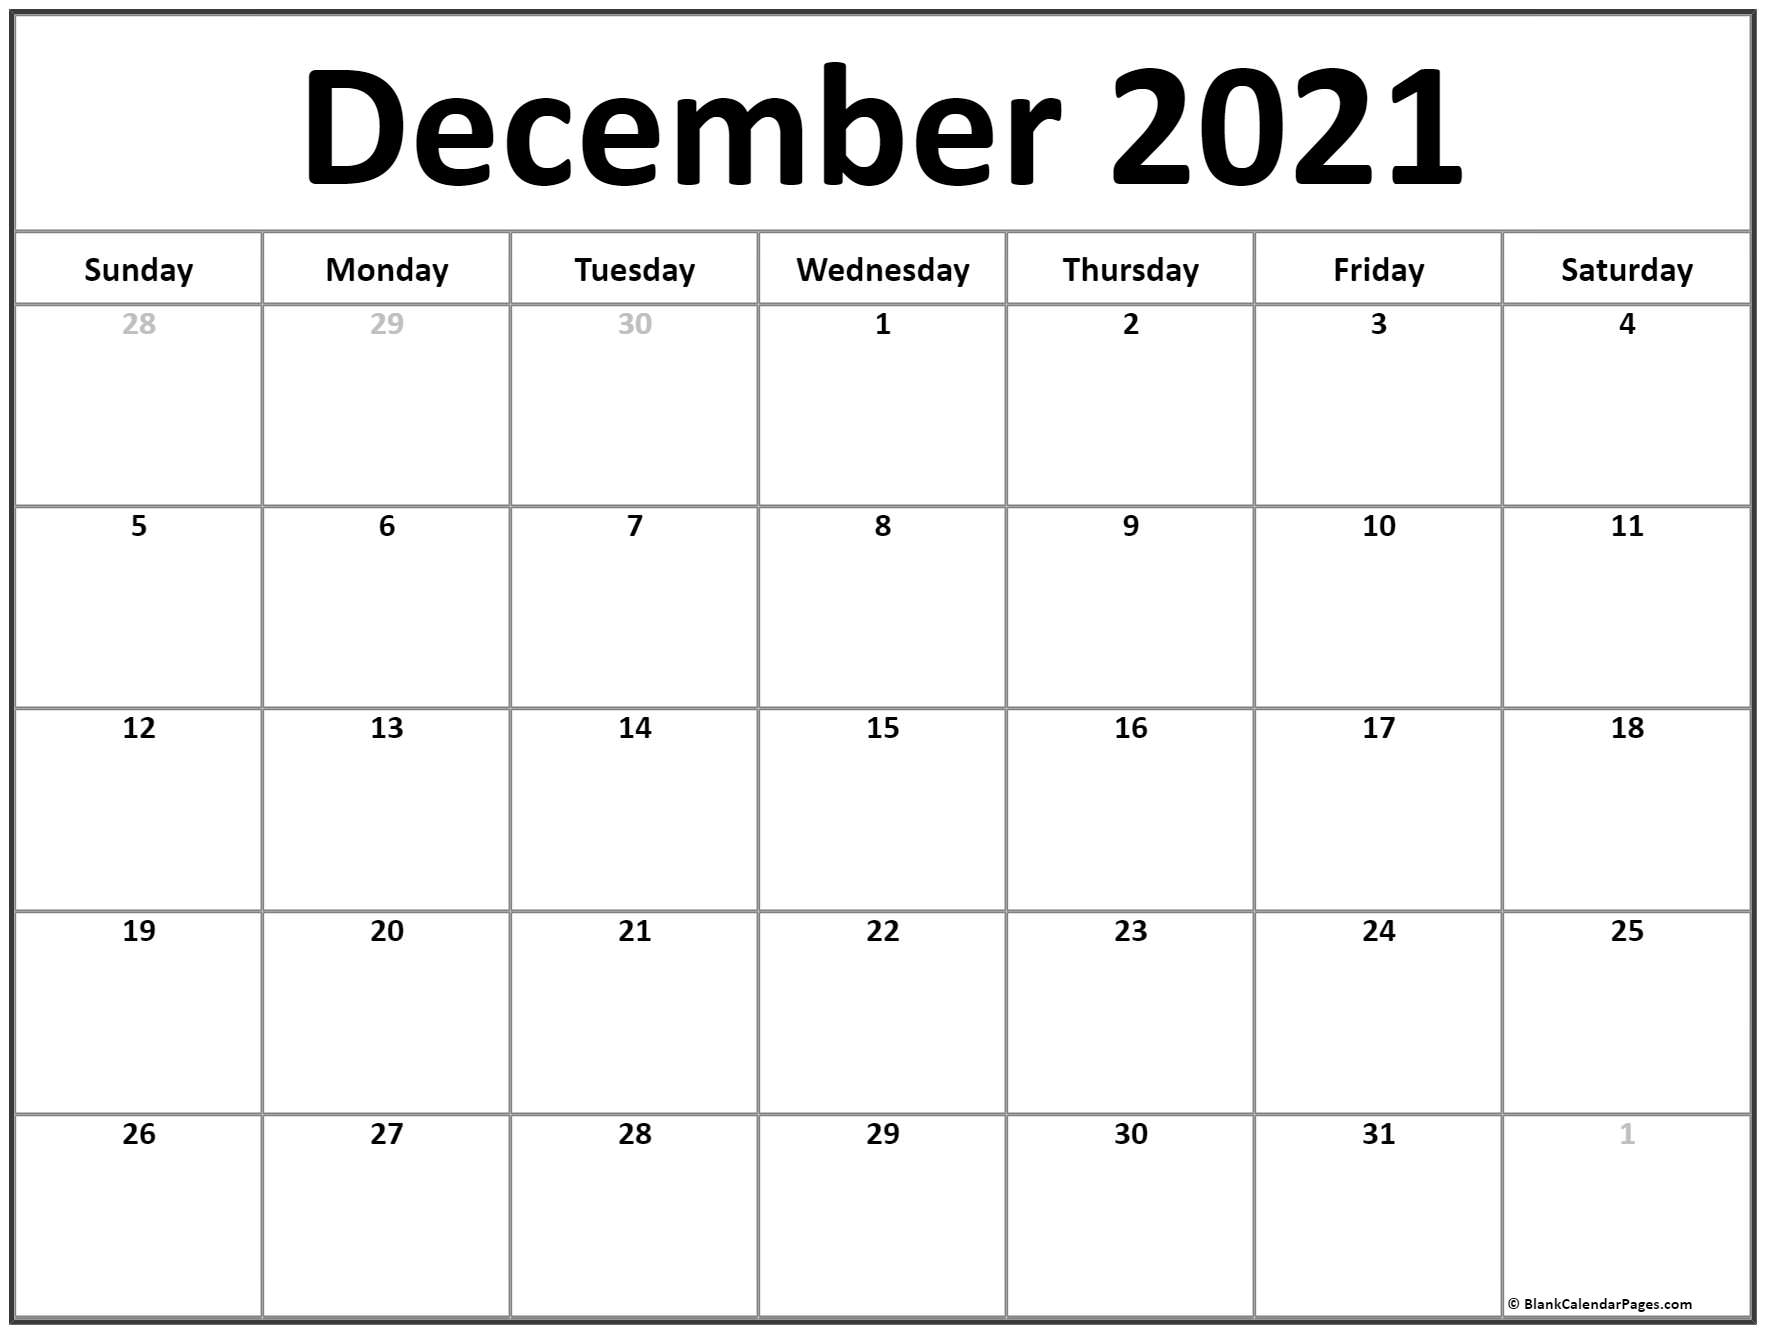 Get Waterproof Calendar 2021